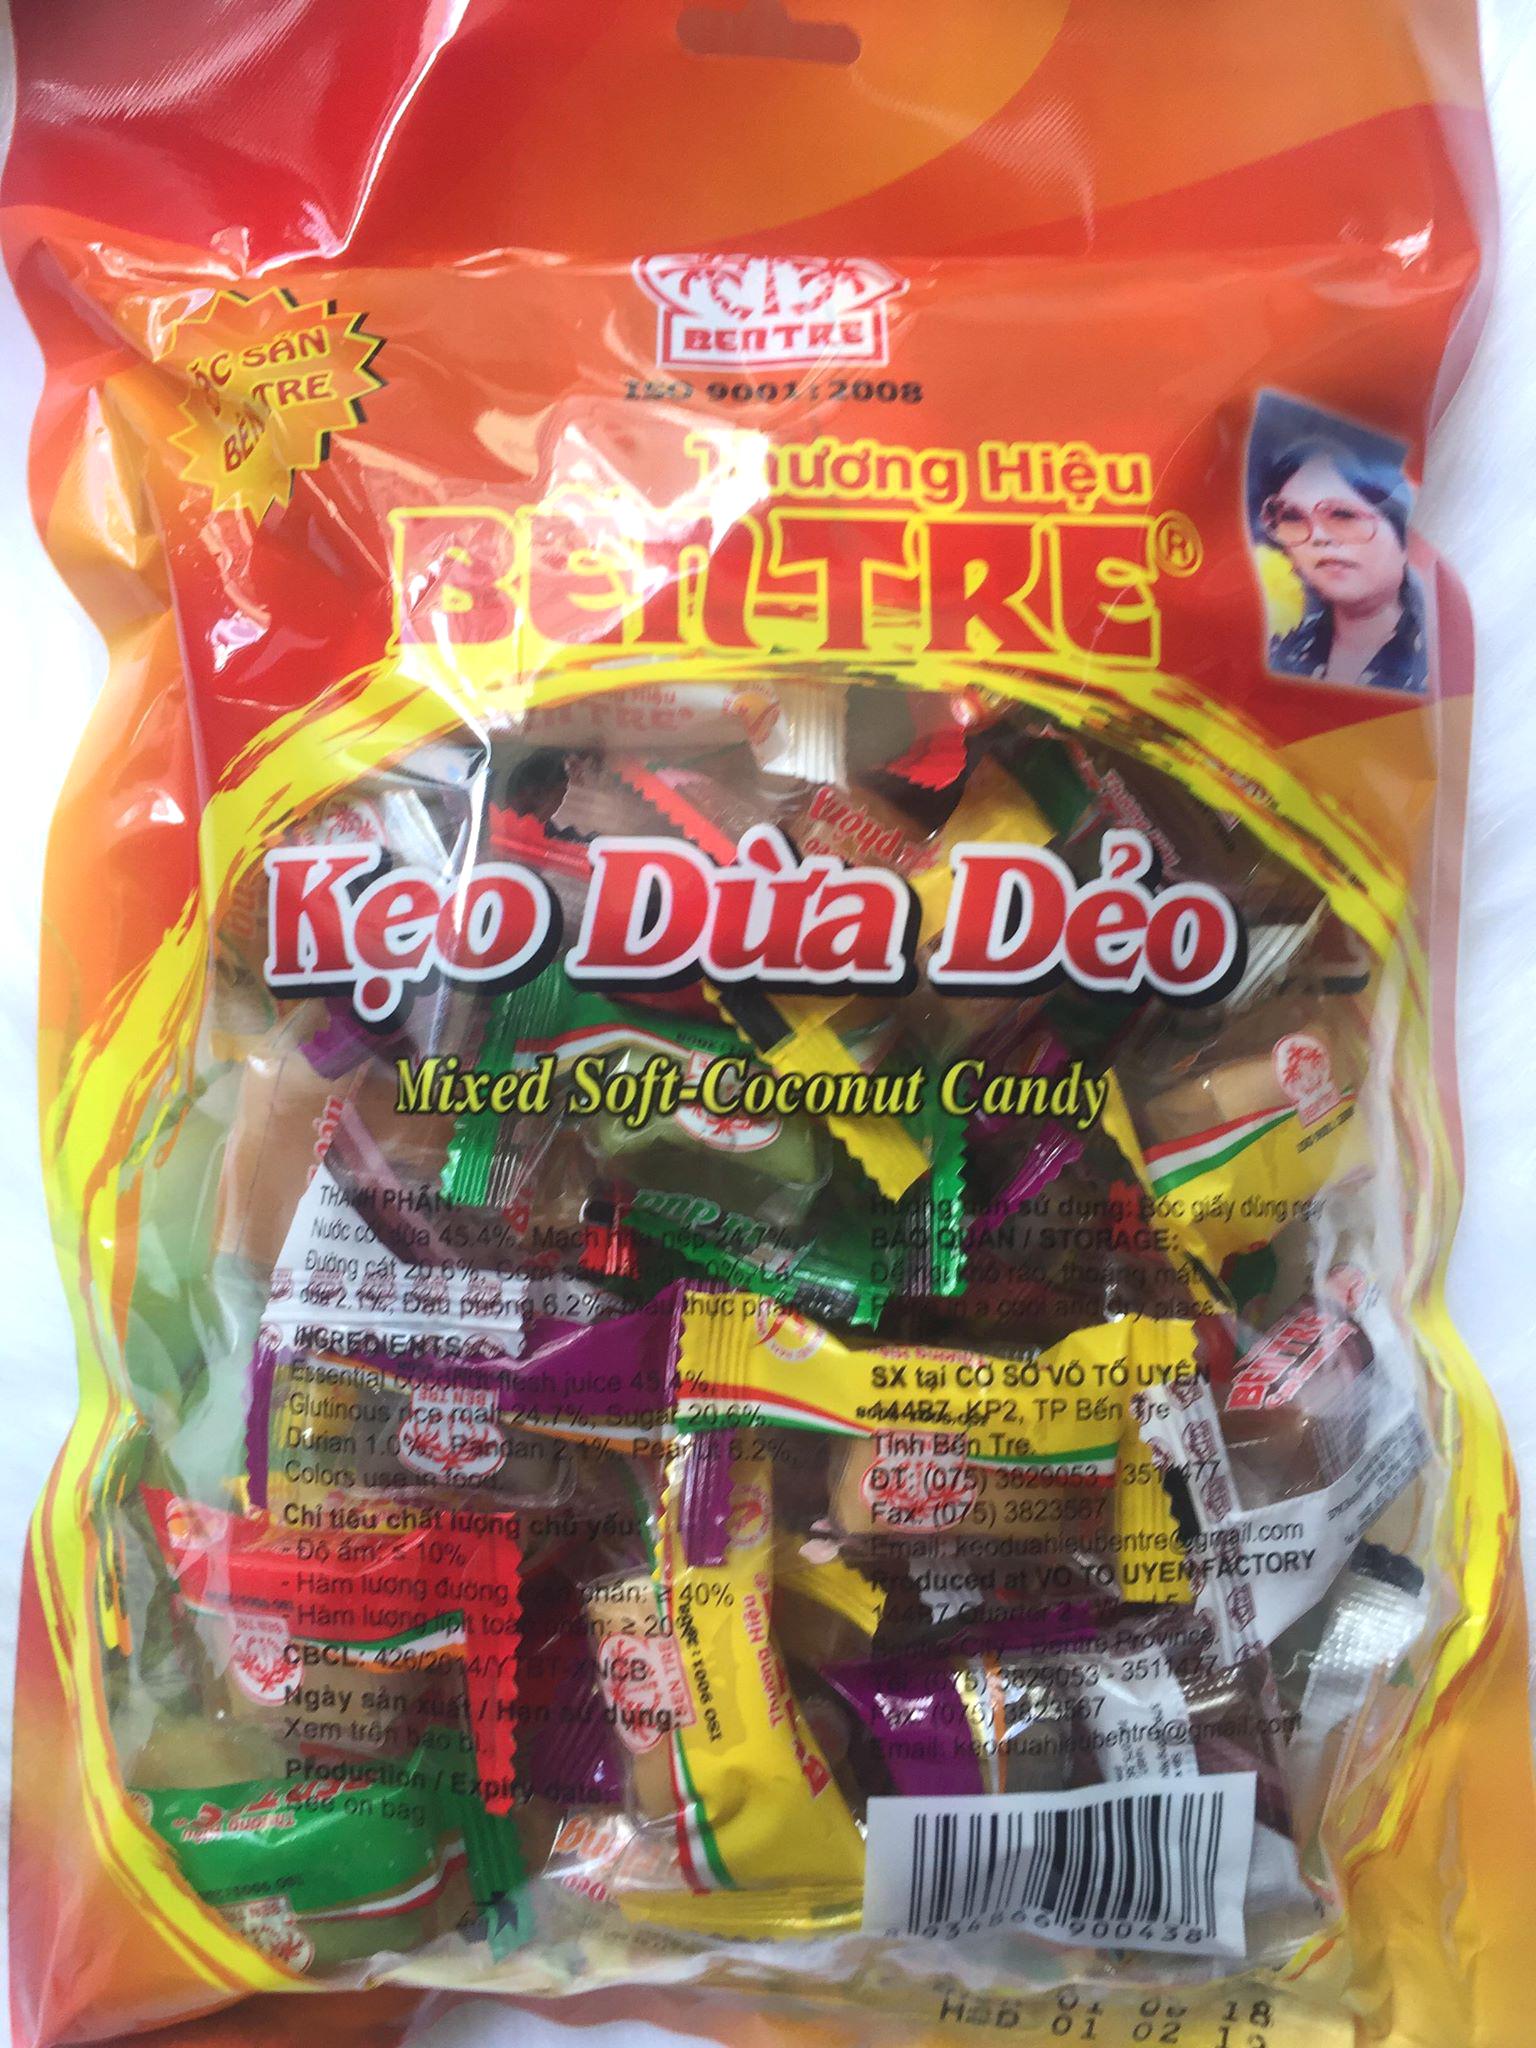 Kẹo dừa dẻo thập cẩm bến tre